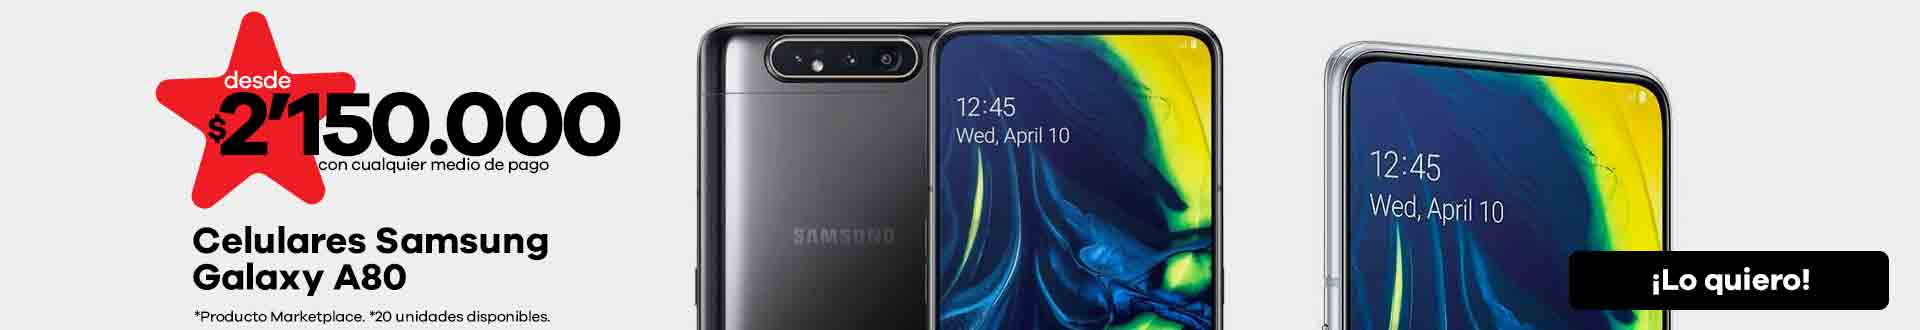 Celulares Samsung Galaxy A80